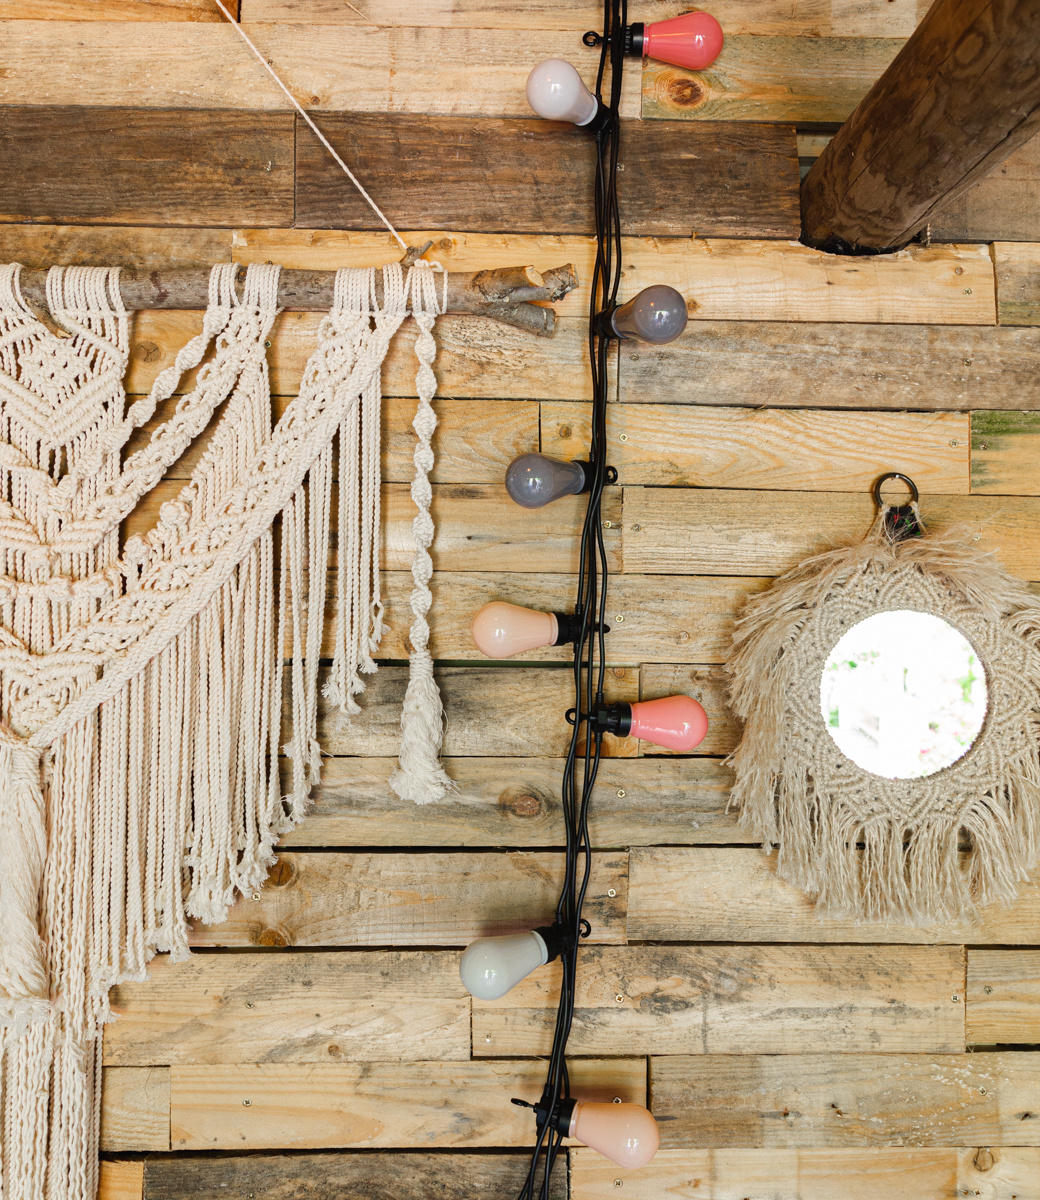 LEDR buiten feestverlichting roze en grijs - Outdoor Patio Lichtslinger Dirty Rose - 10 LED lampen -